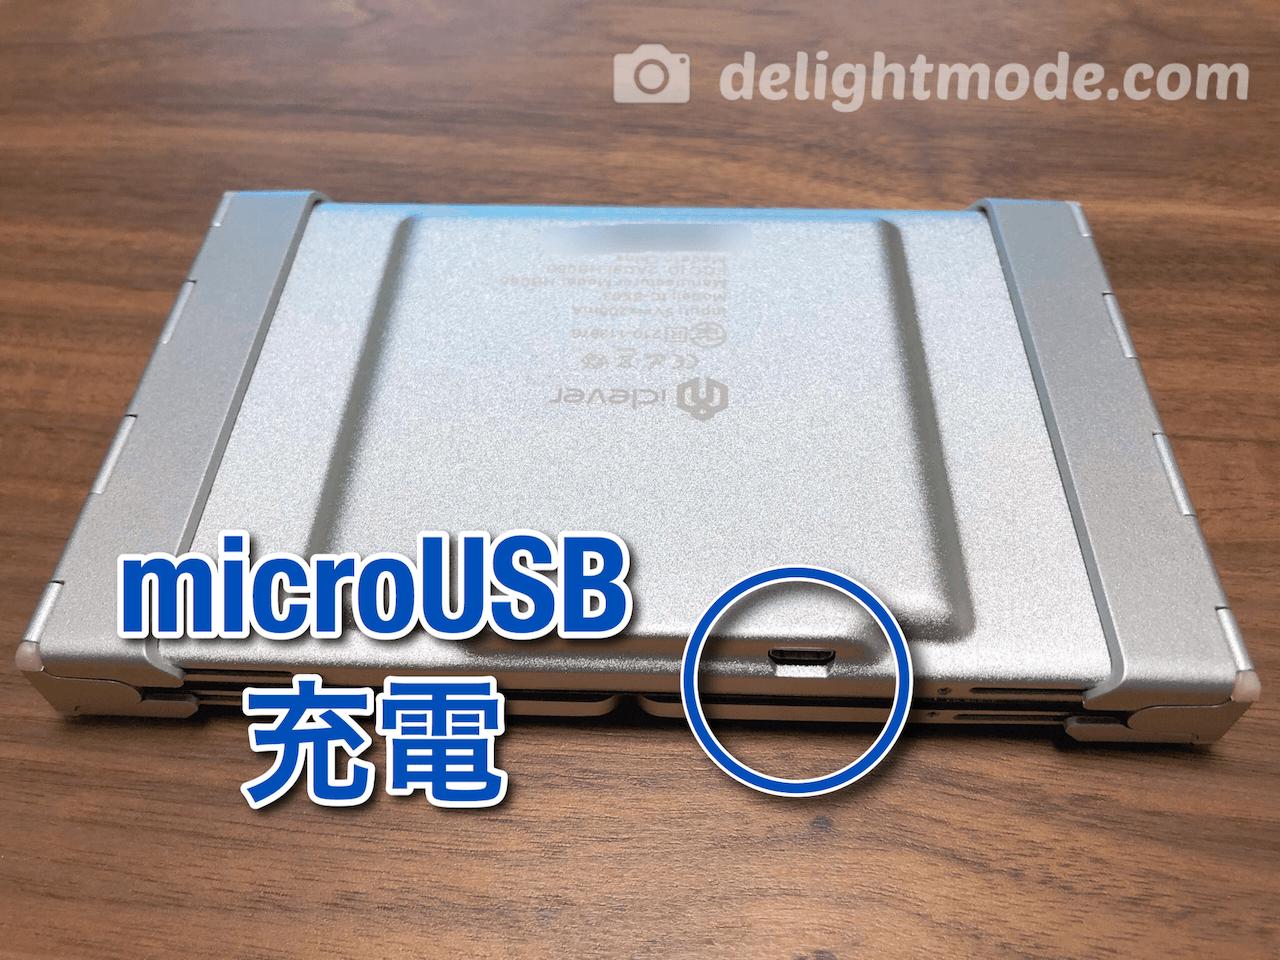 「iClever IC-BK03」Bluetoothキーボード本体裏側です。microUSB端子から充電できます。